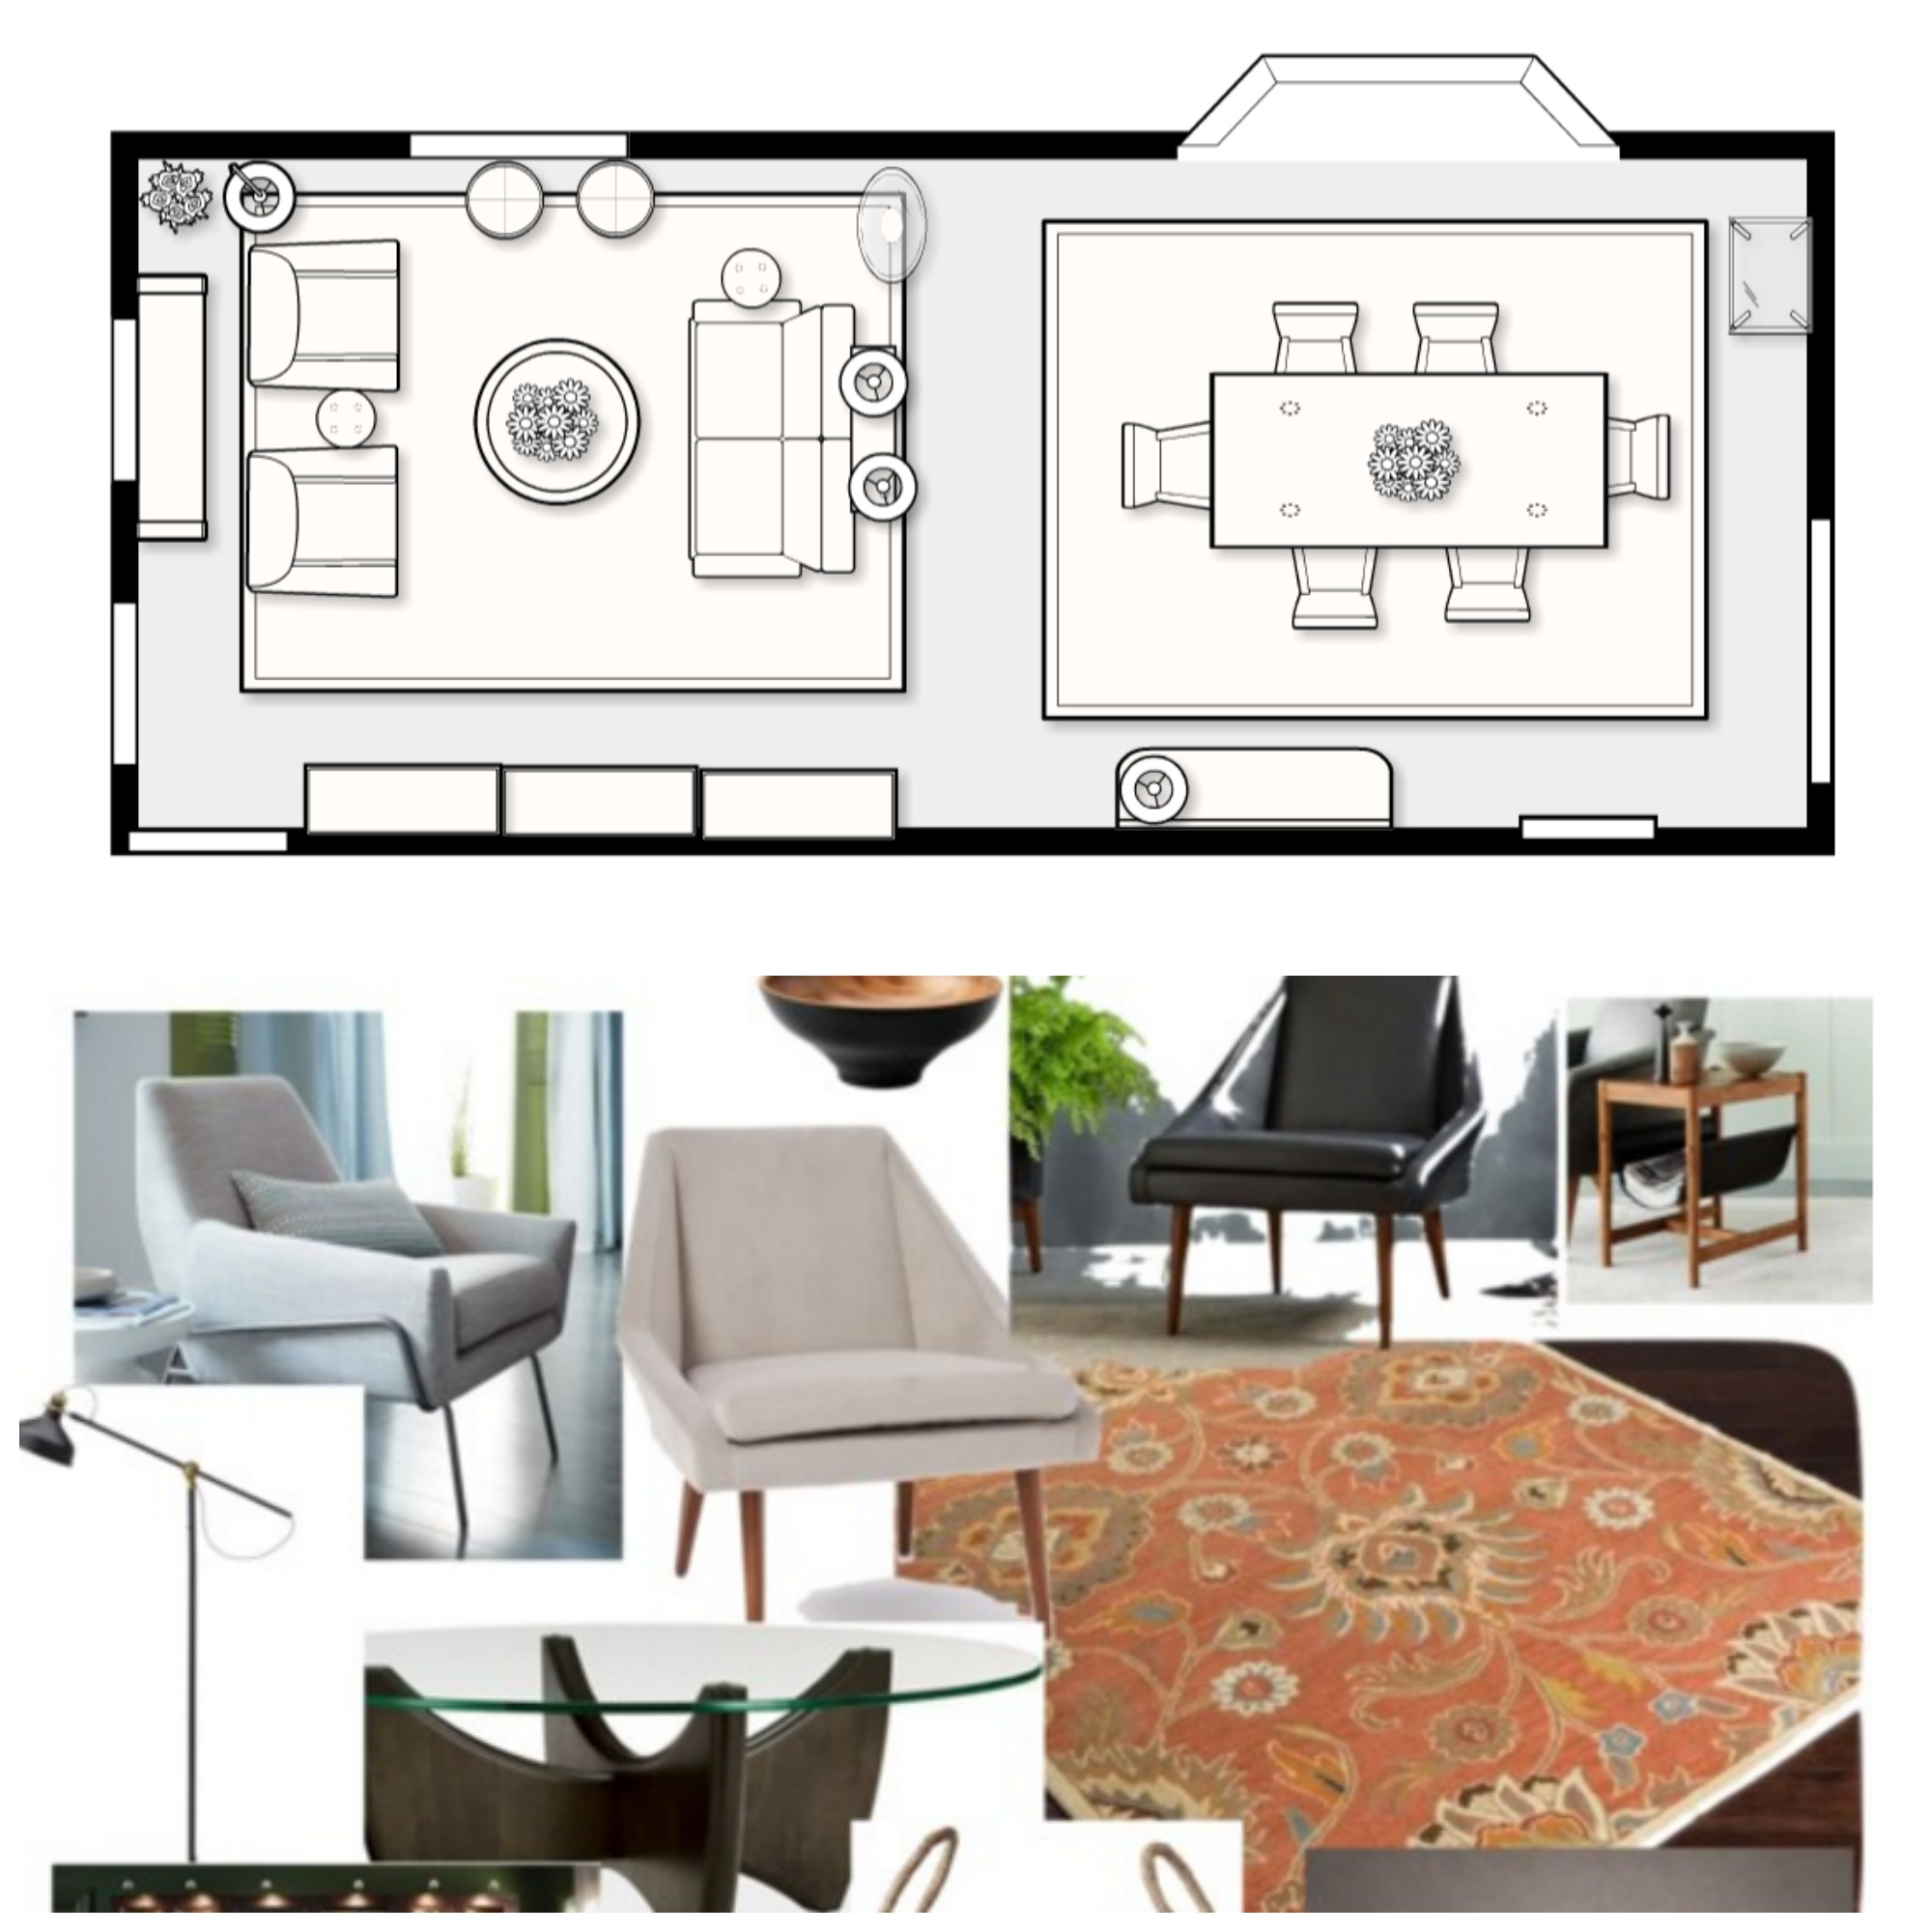 floor plan.jpg